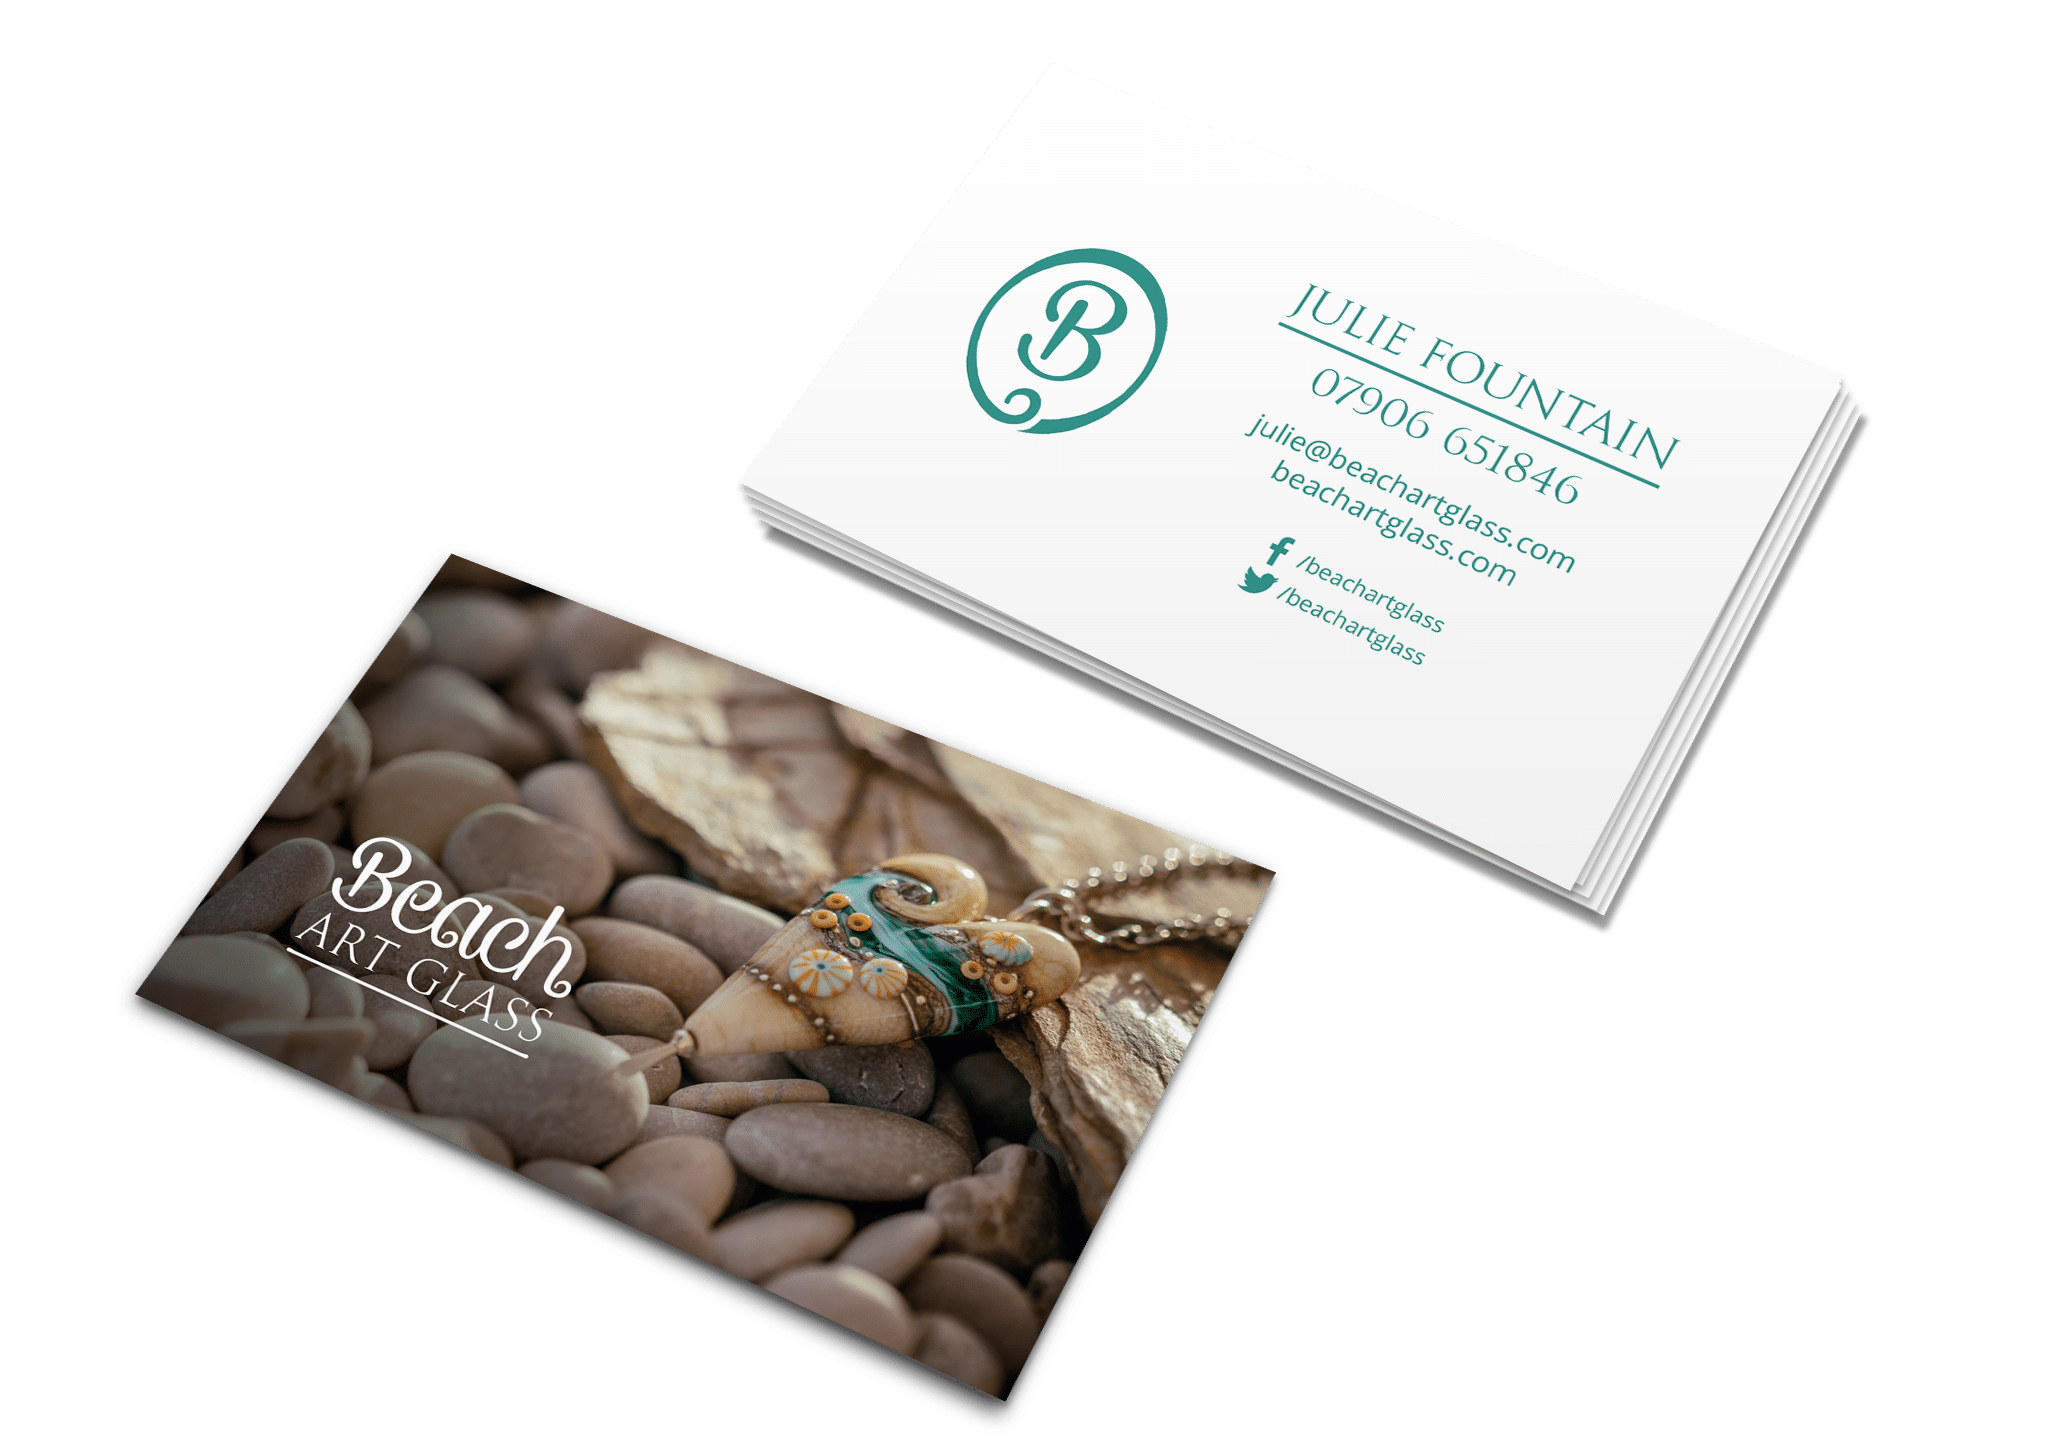 F8 - Business Card Design & Print Services - Worcester